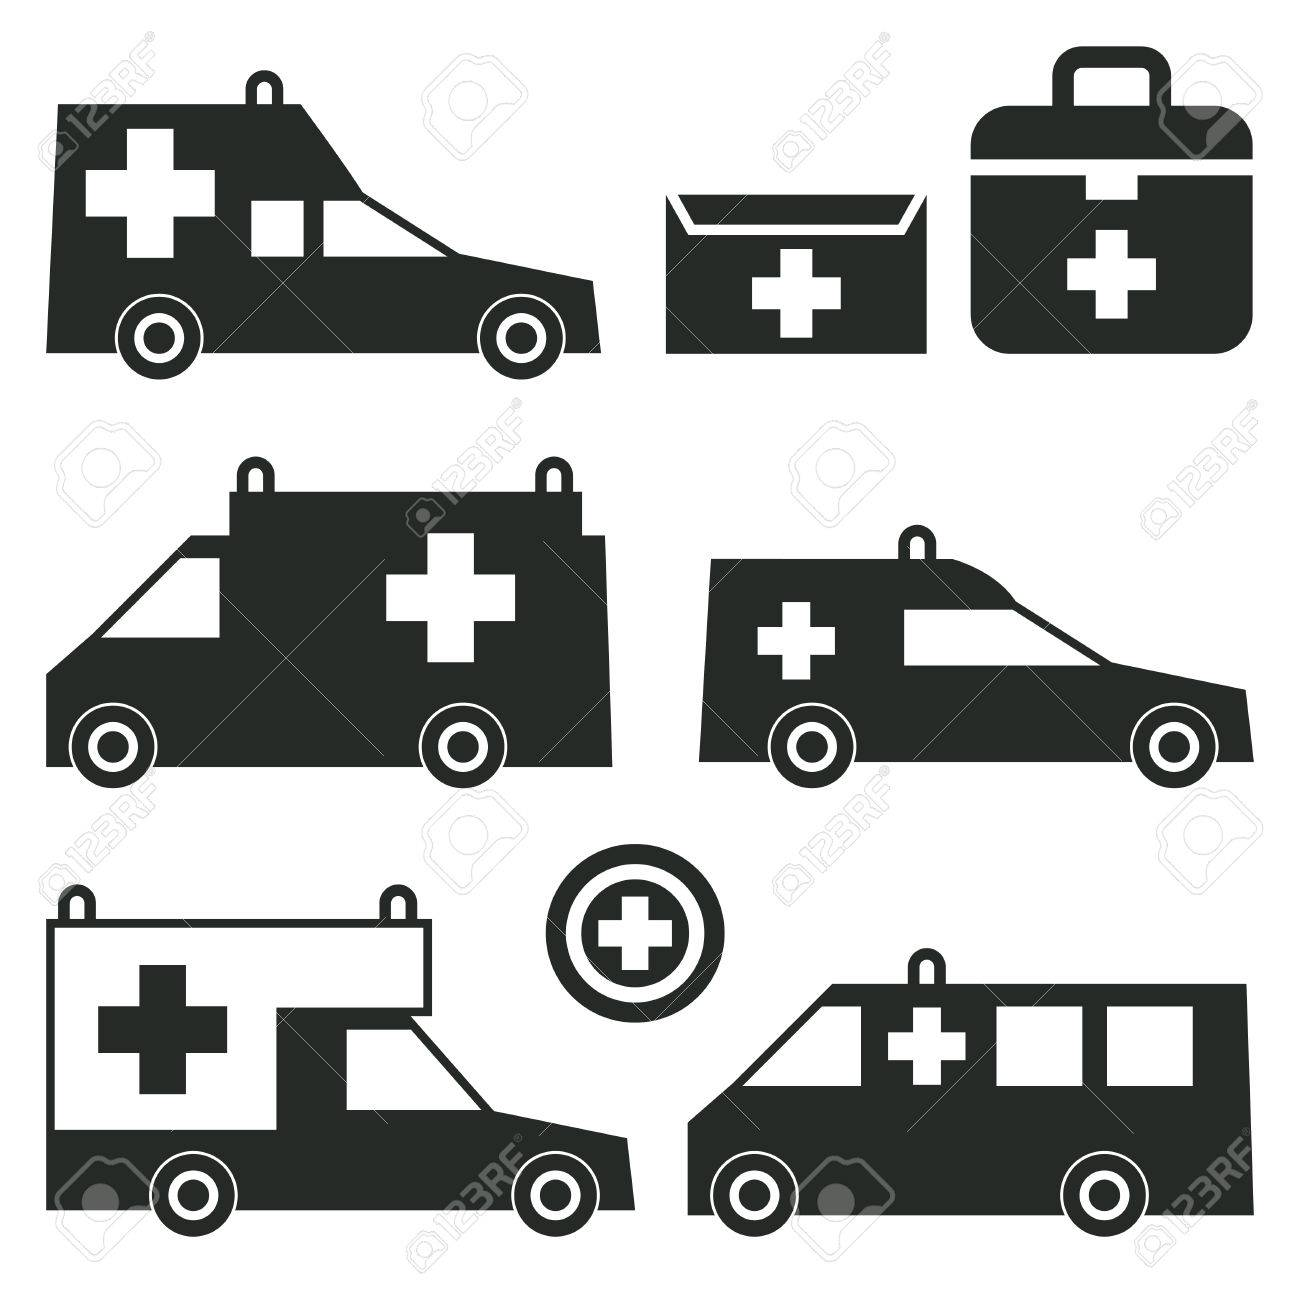 Ambulance or emergency cars signs or symbols isolated on white background set ambulance car silhouettes